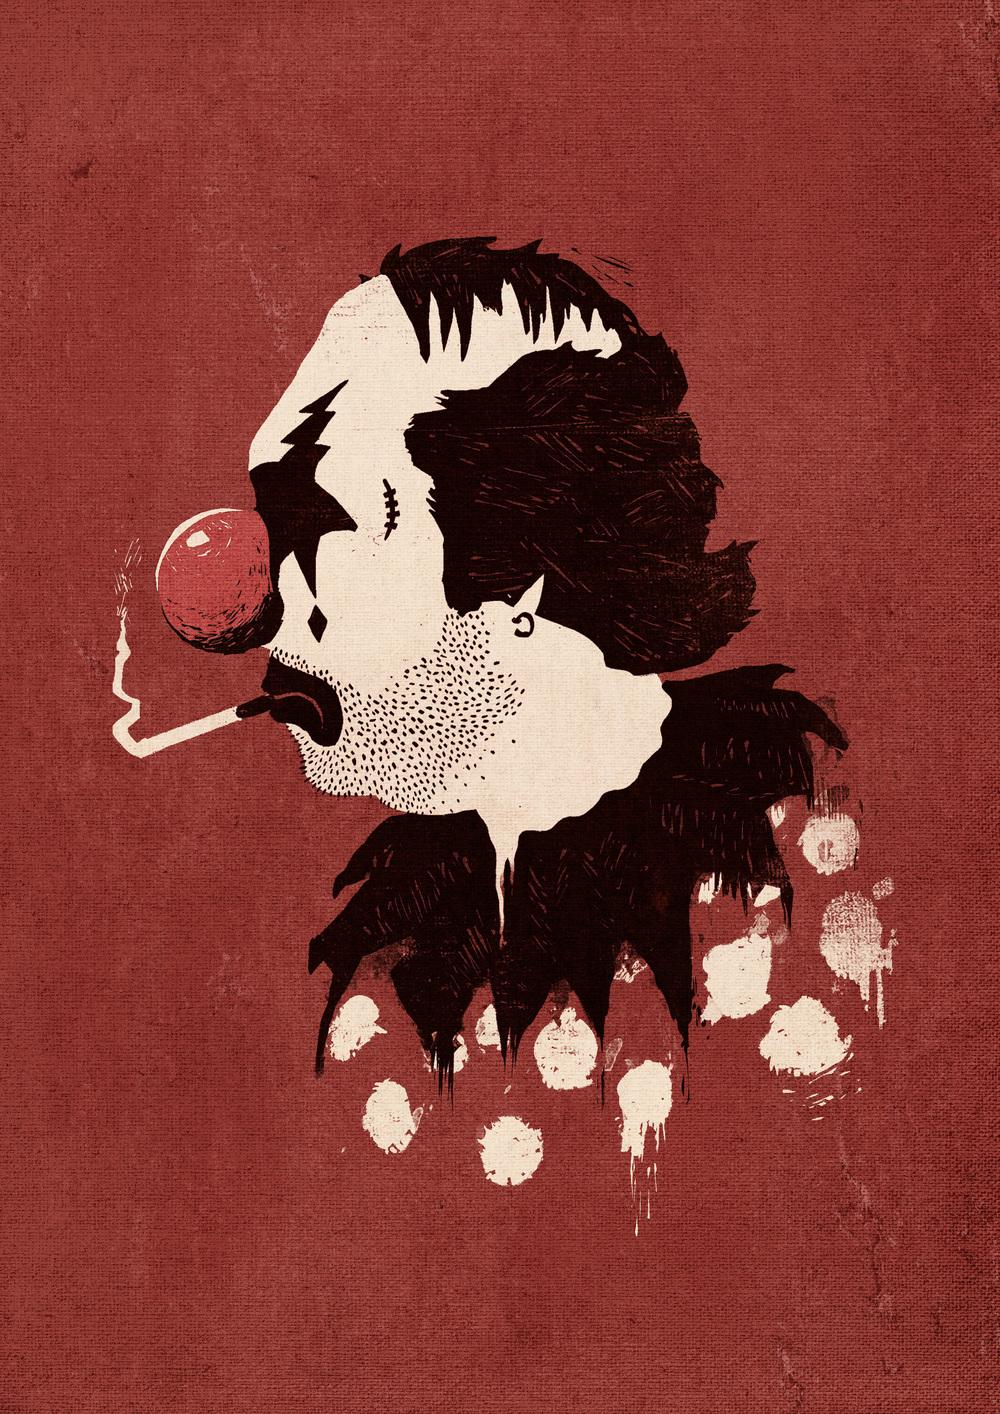 Clown Hates Carnival